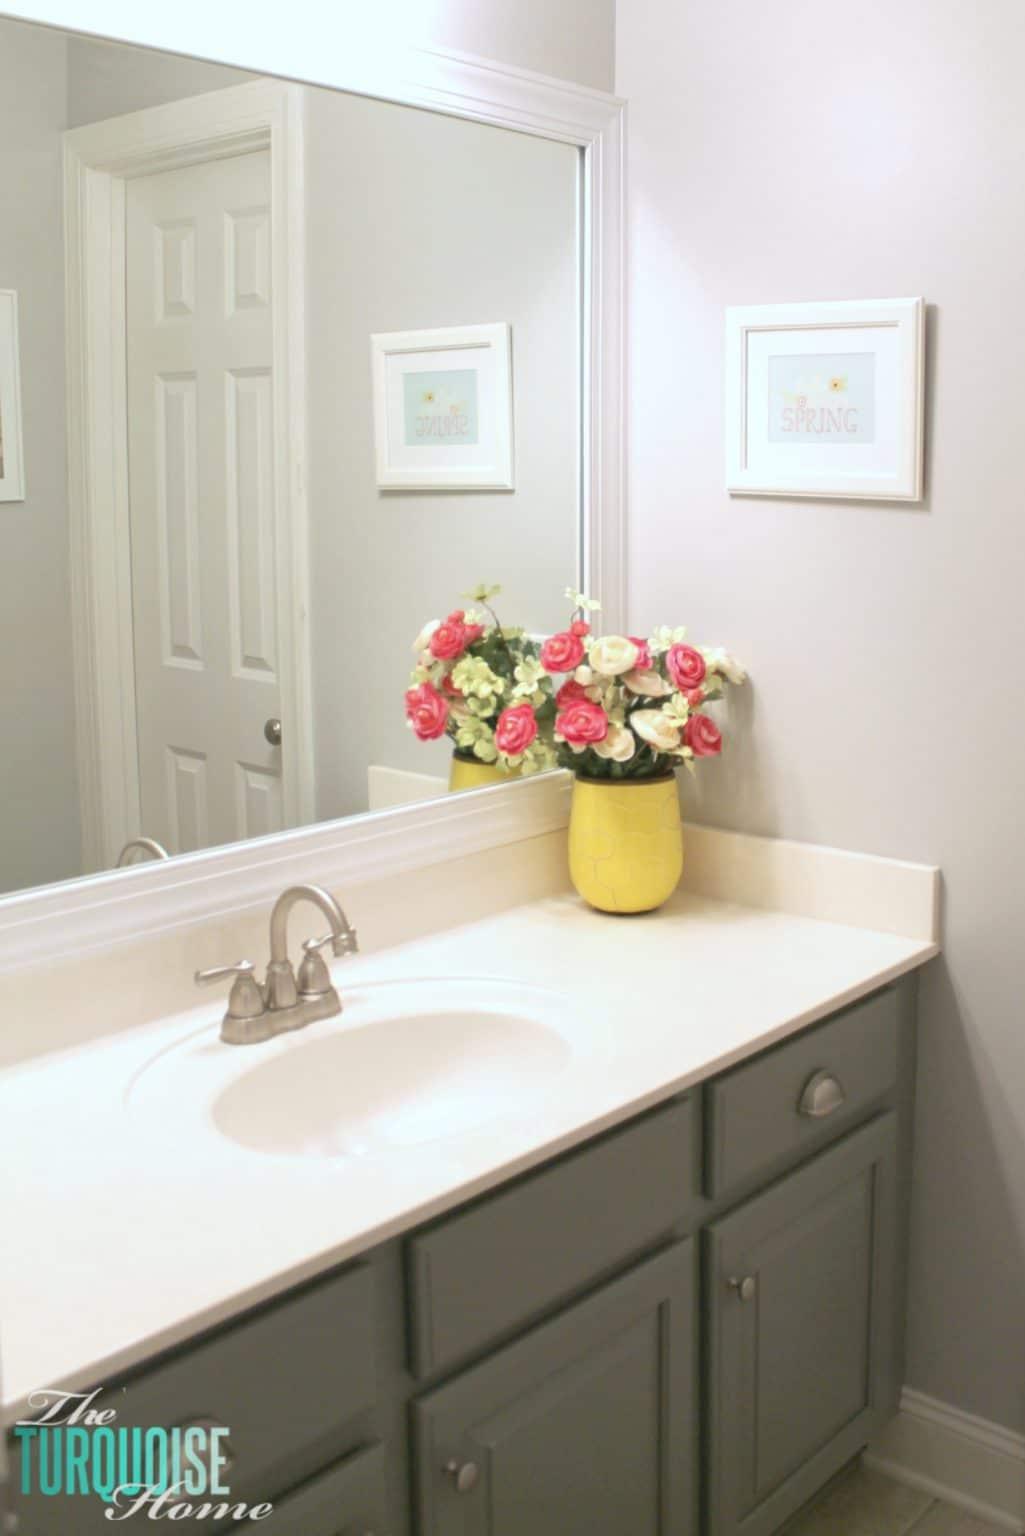 Telescoping Bathroom Mirror Lighted Bathroom Vanity Mirrors.How To ...